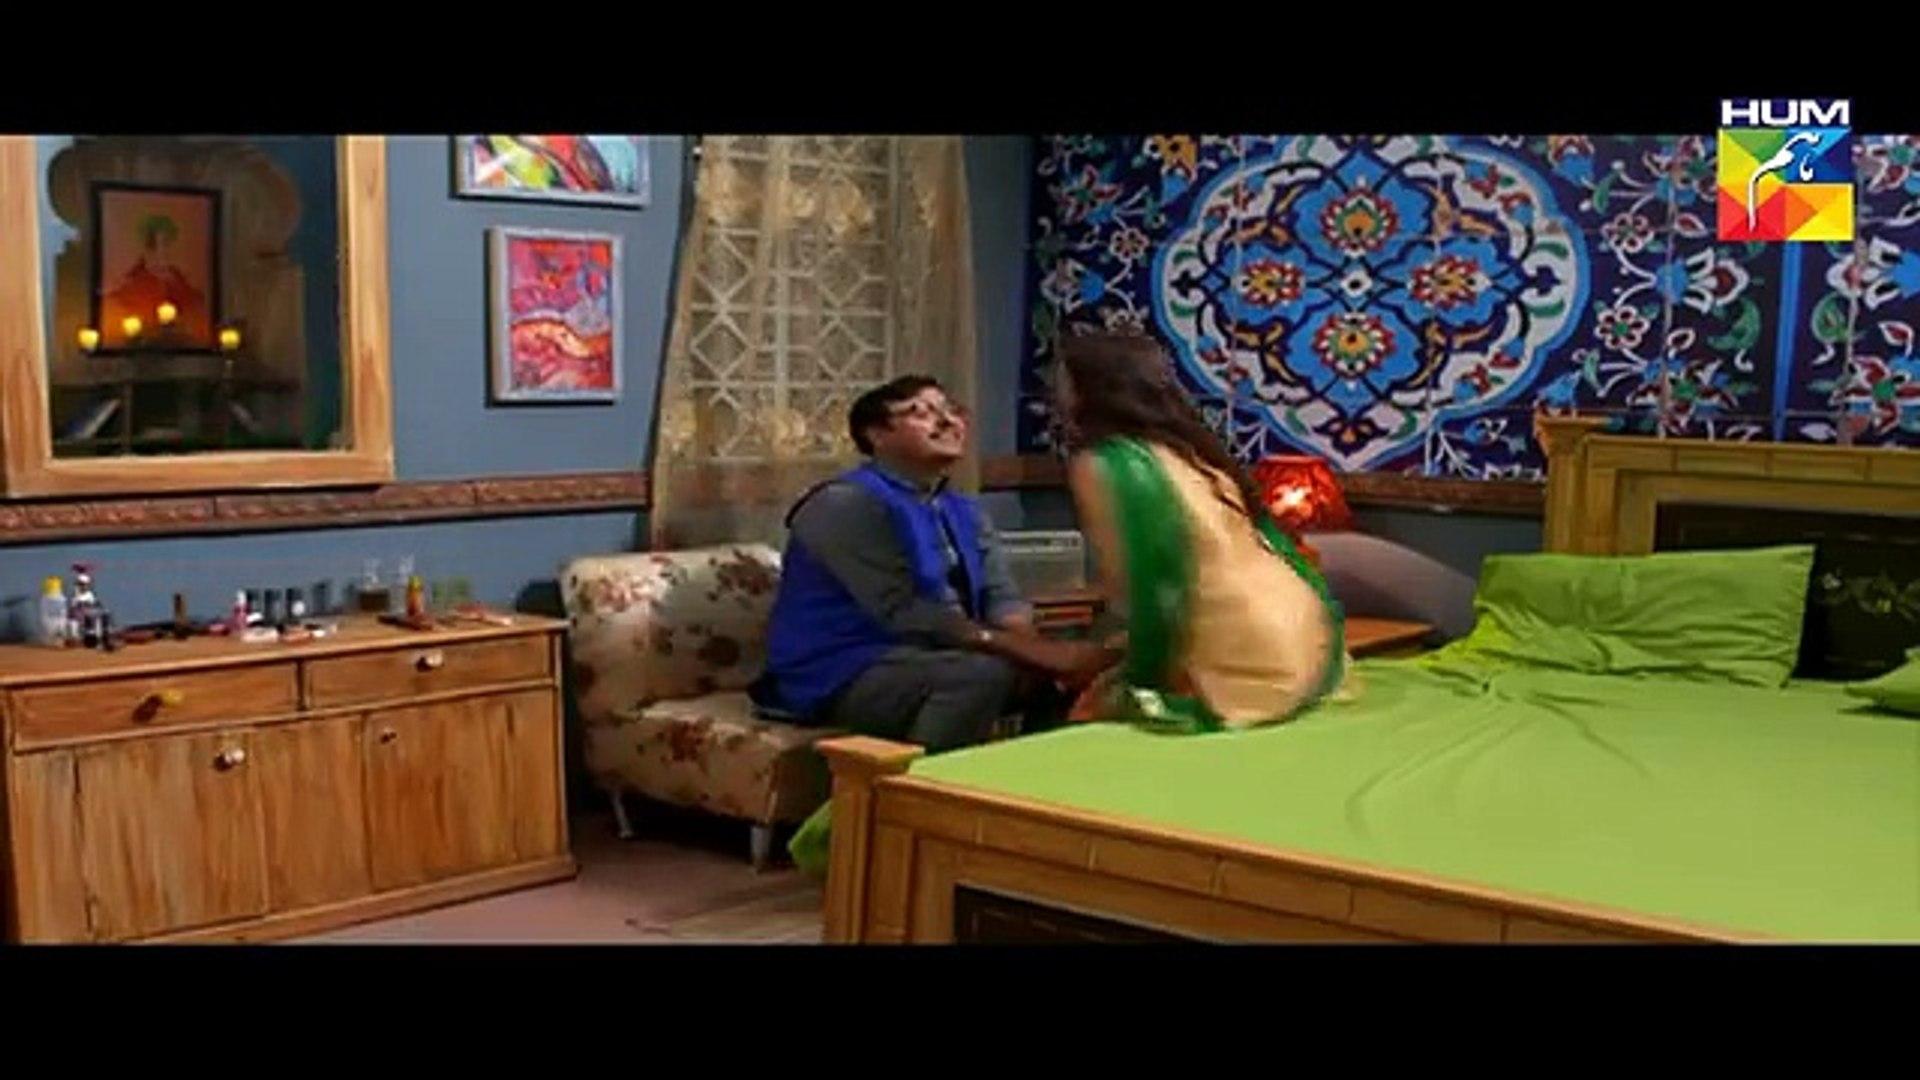 Dar Si Jati Hai Sila Episode #21 HUM TV Drama 28 March 2018 its Technologist plz follow me & lat